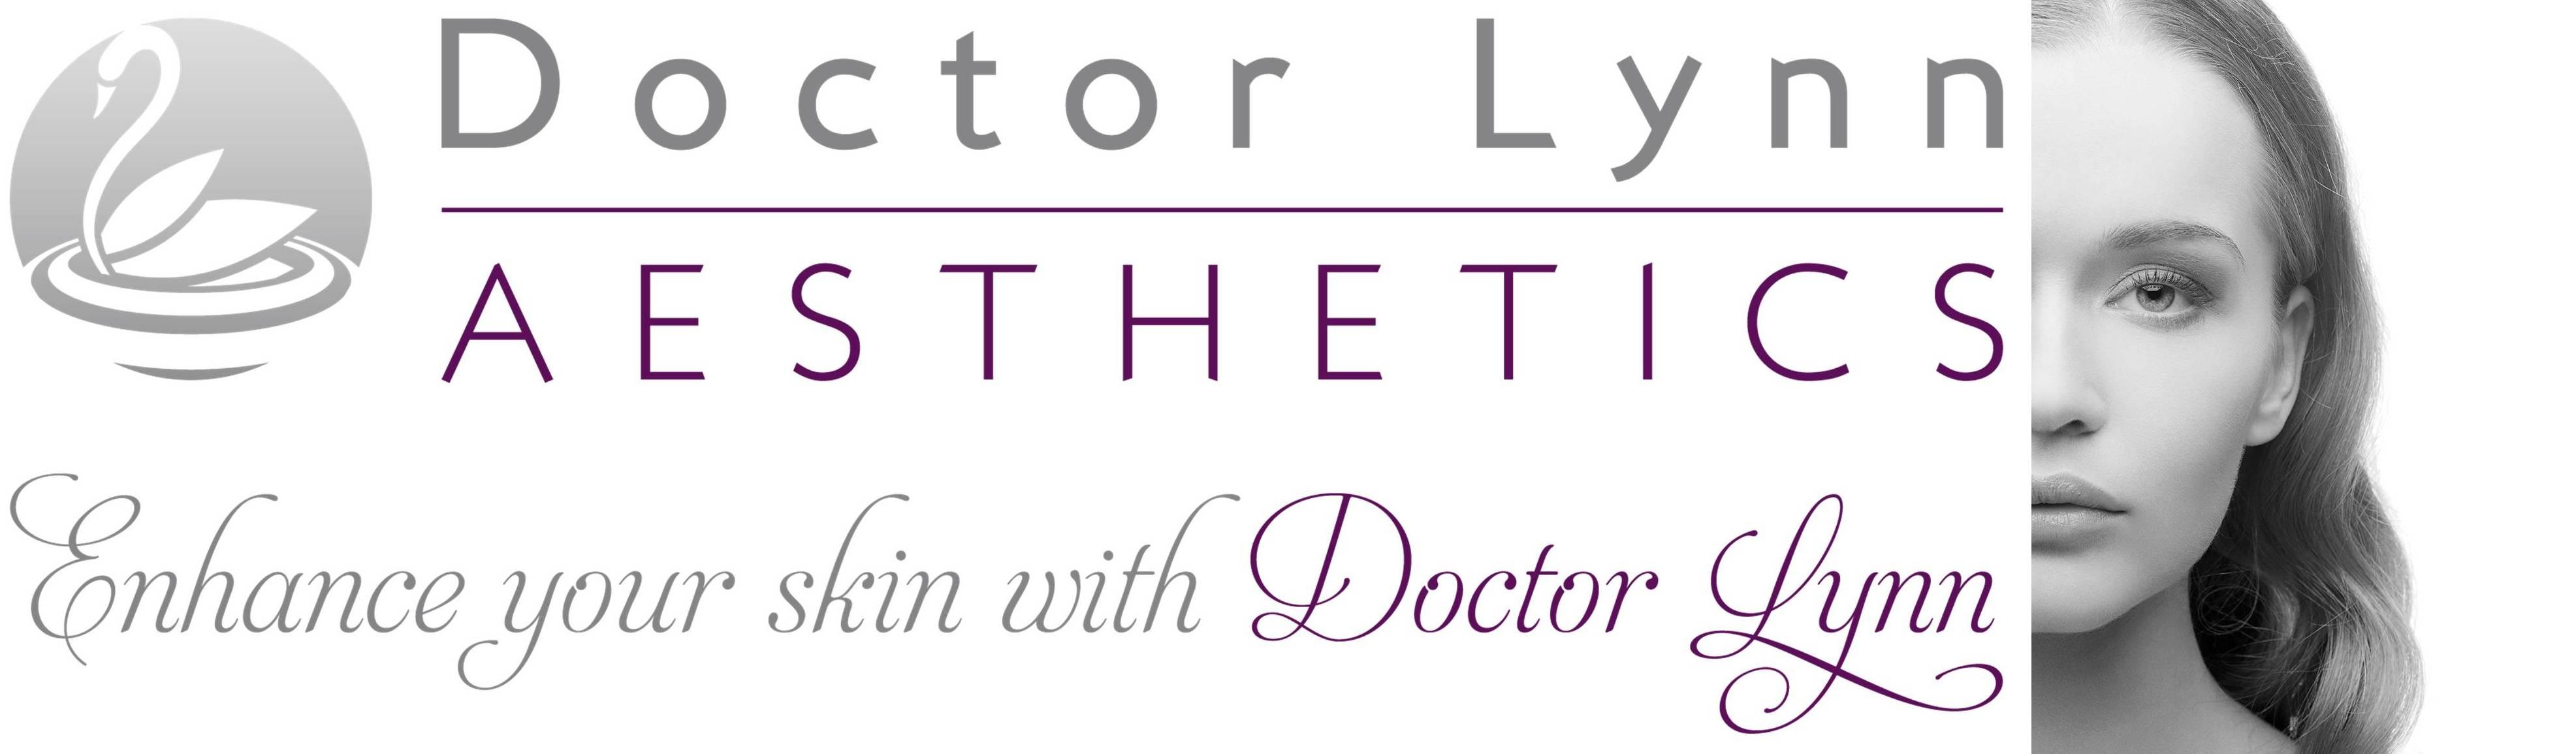 Doctor Lynn